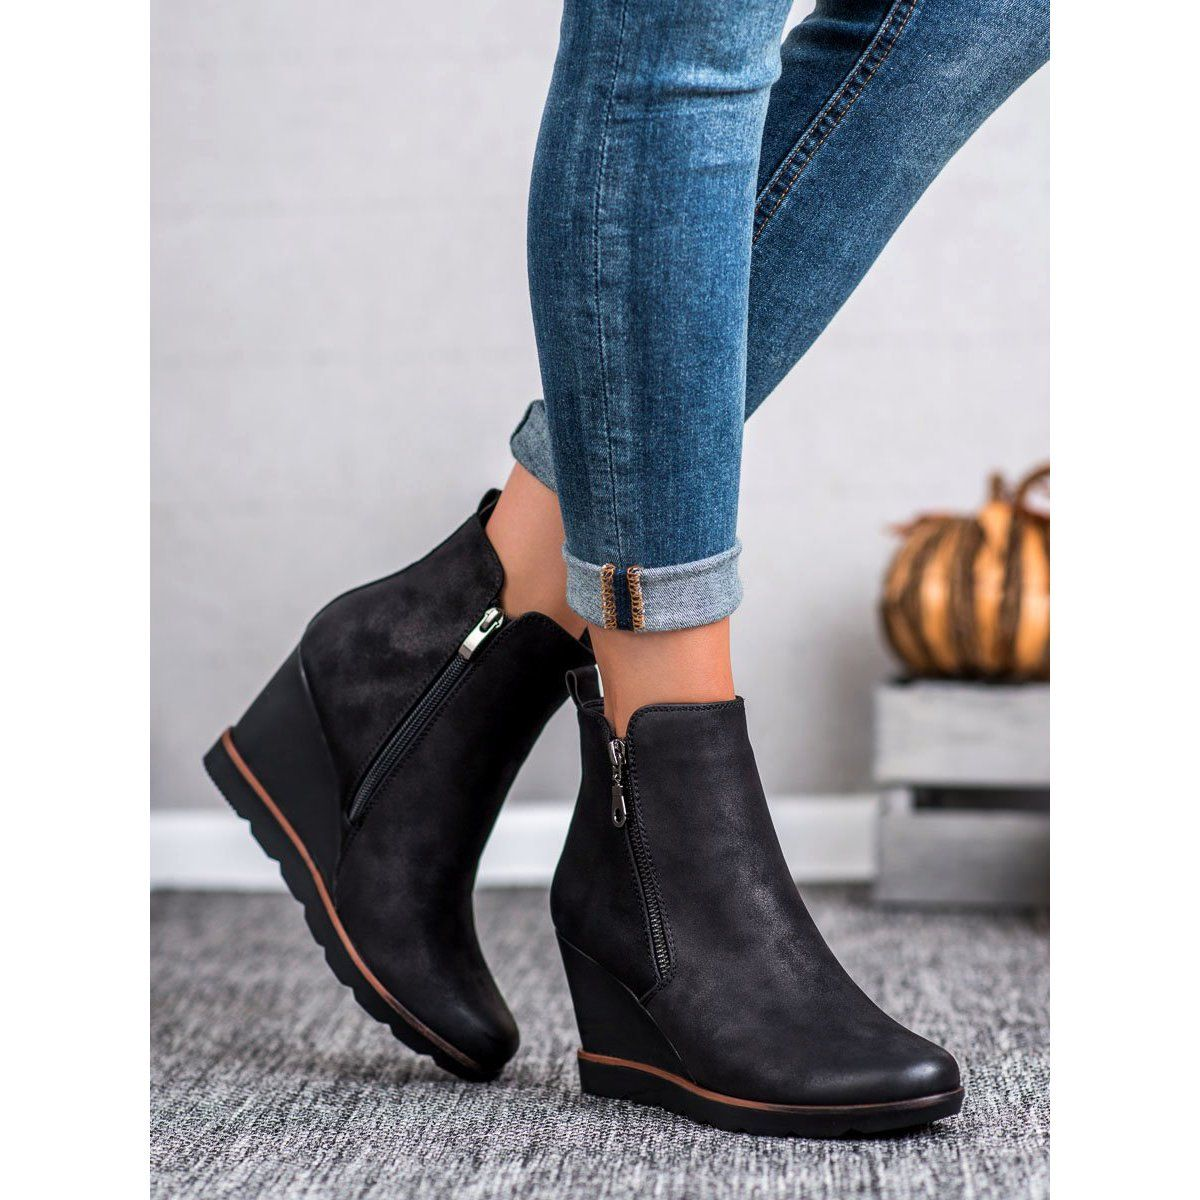 Filippo Czarne Botki Na Koturnie Ankle Boot Chelsea Boots Shoes